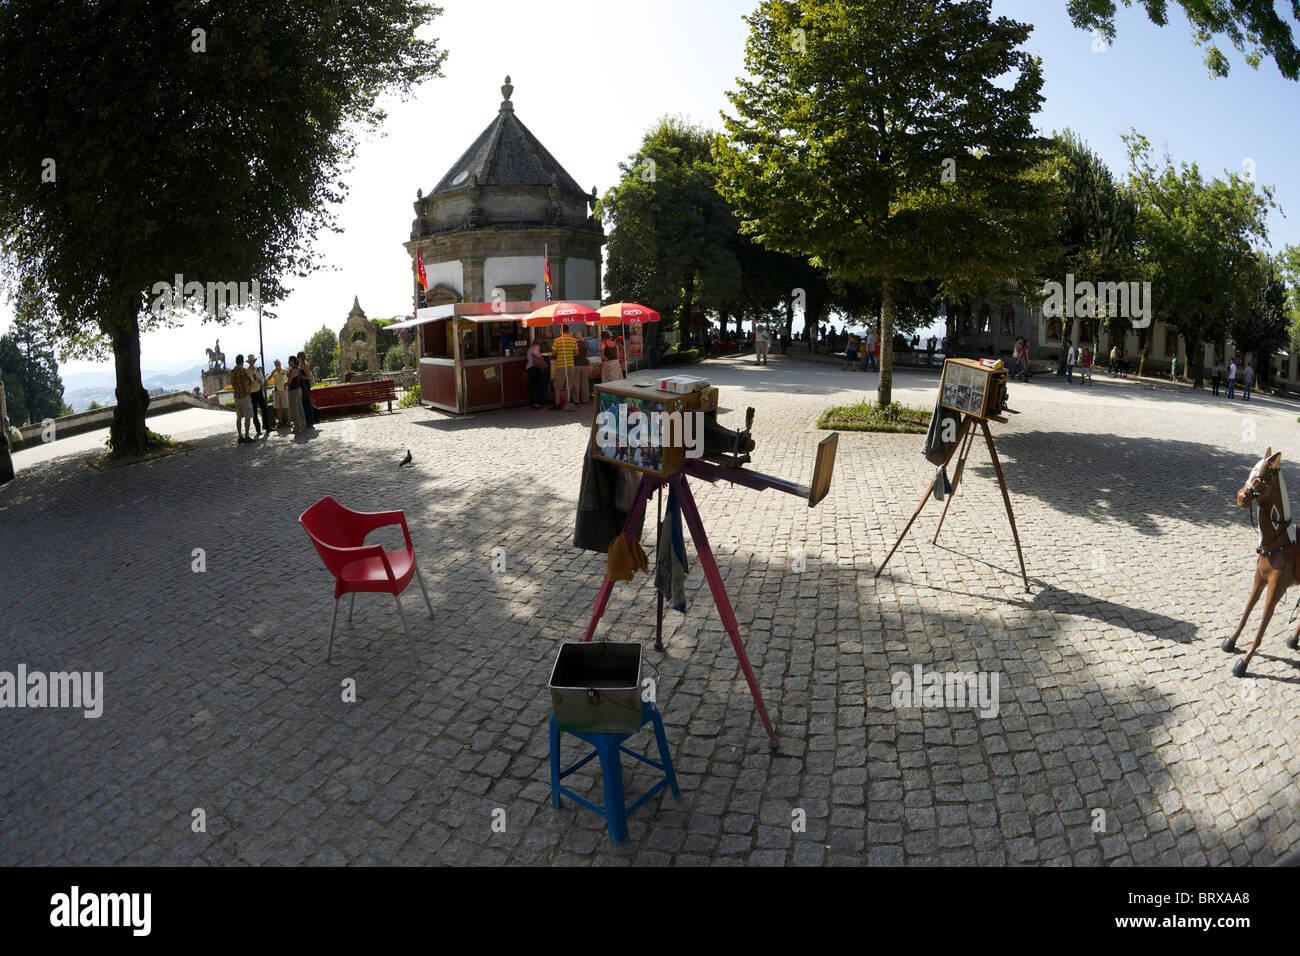 Commercial portrait cameras set up at Bom Jesús do Monte, Braga, Portugal - Stock Image